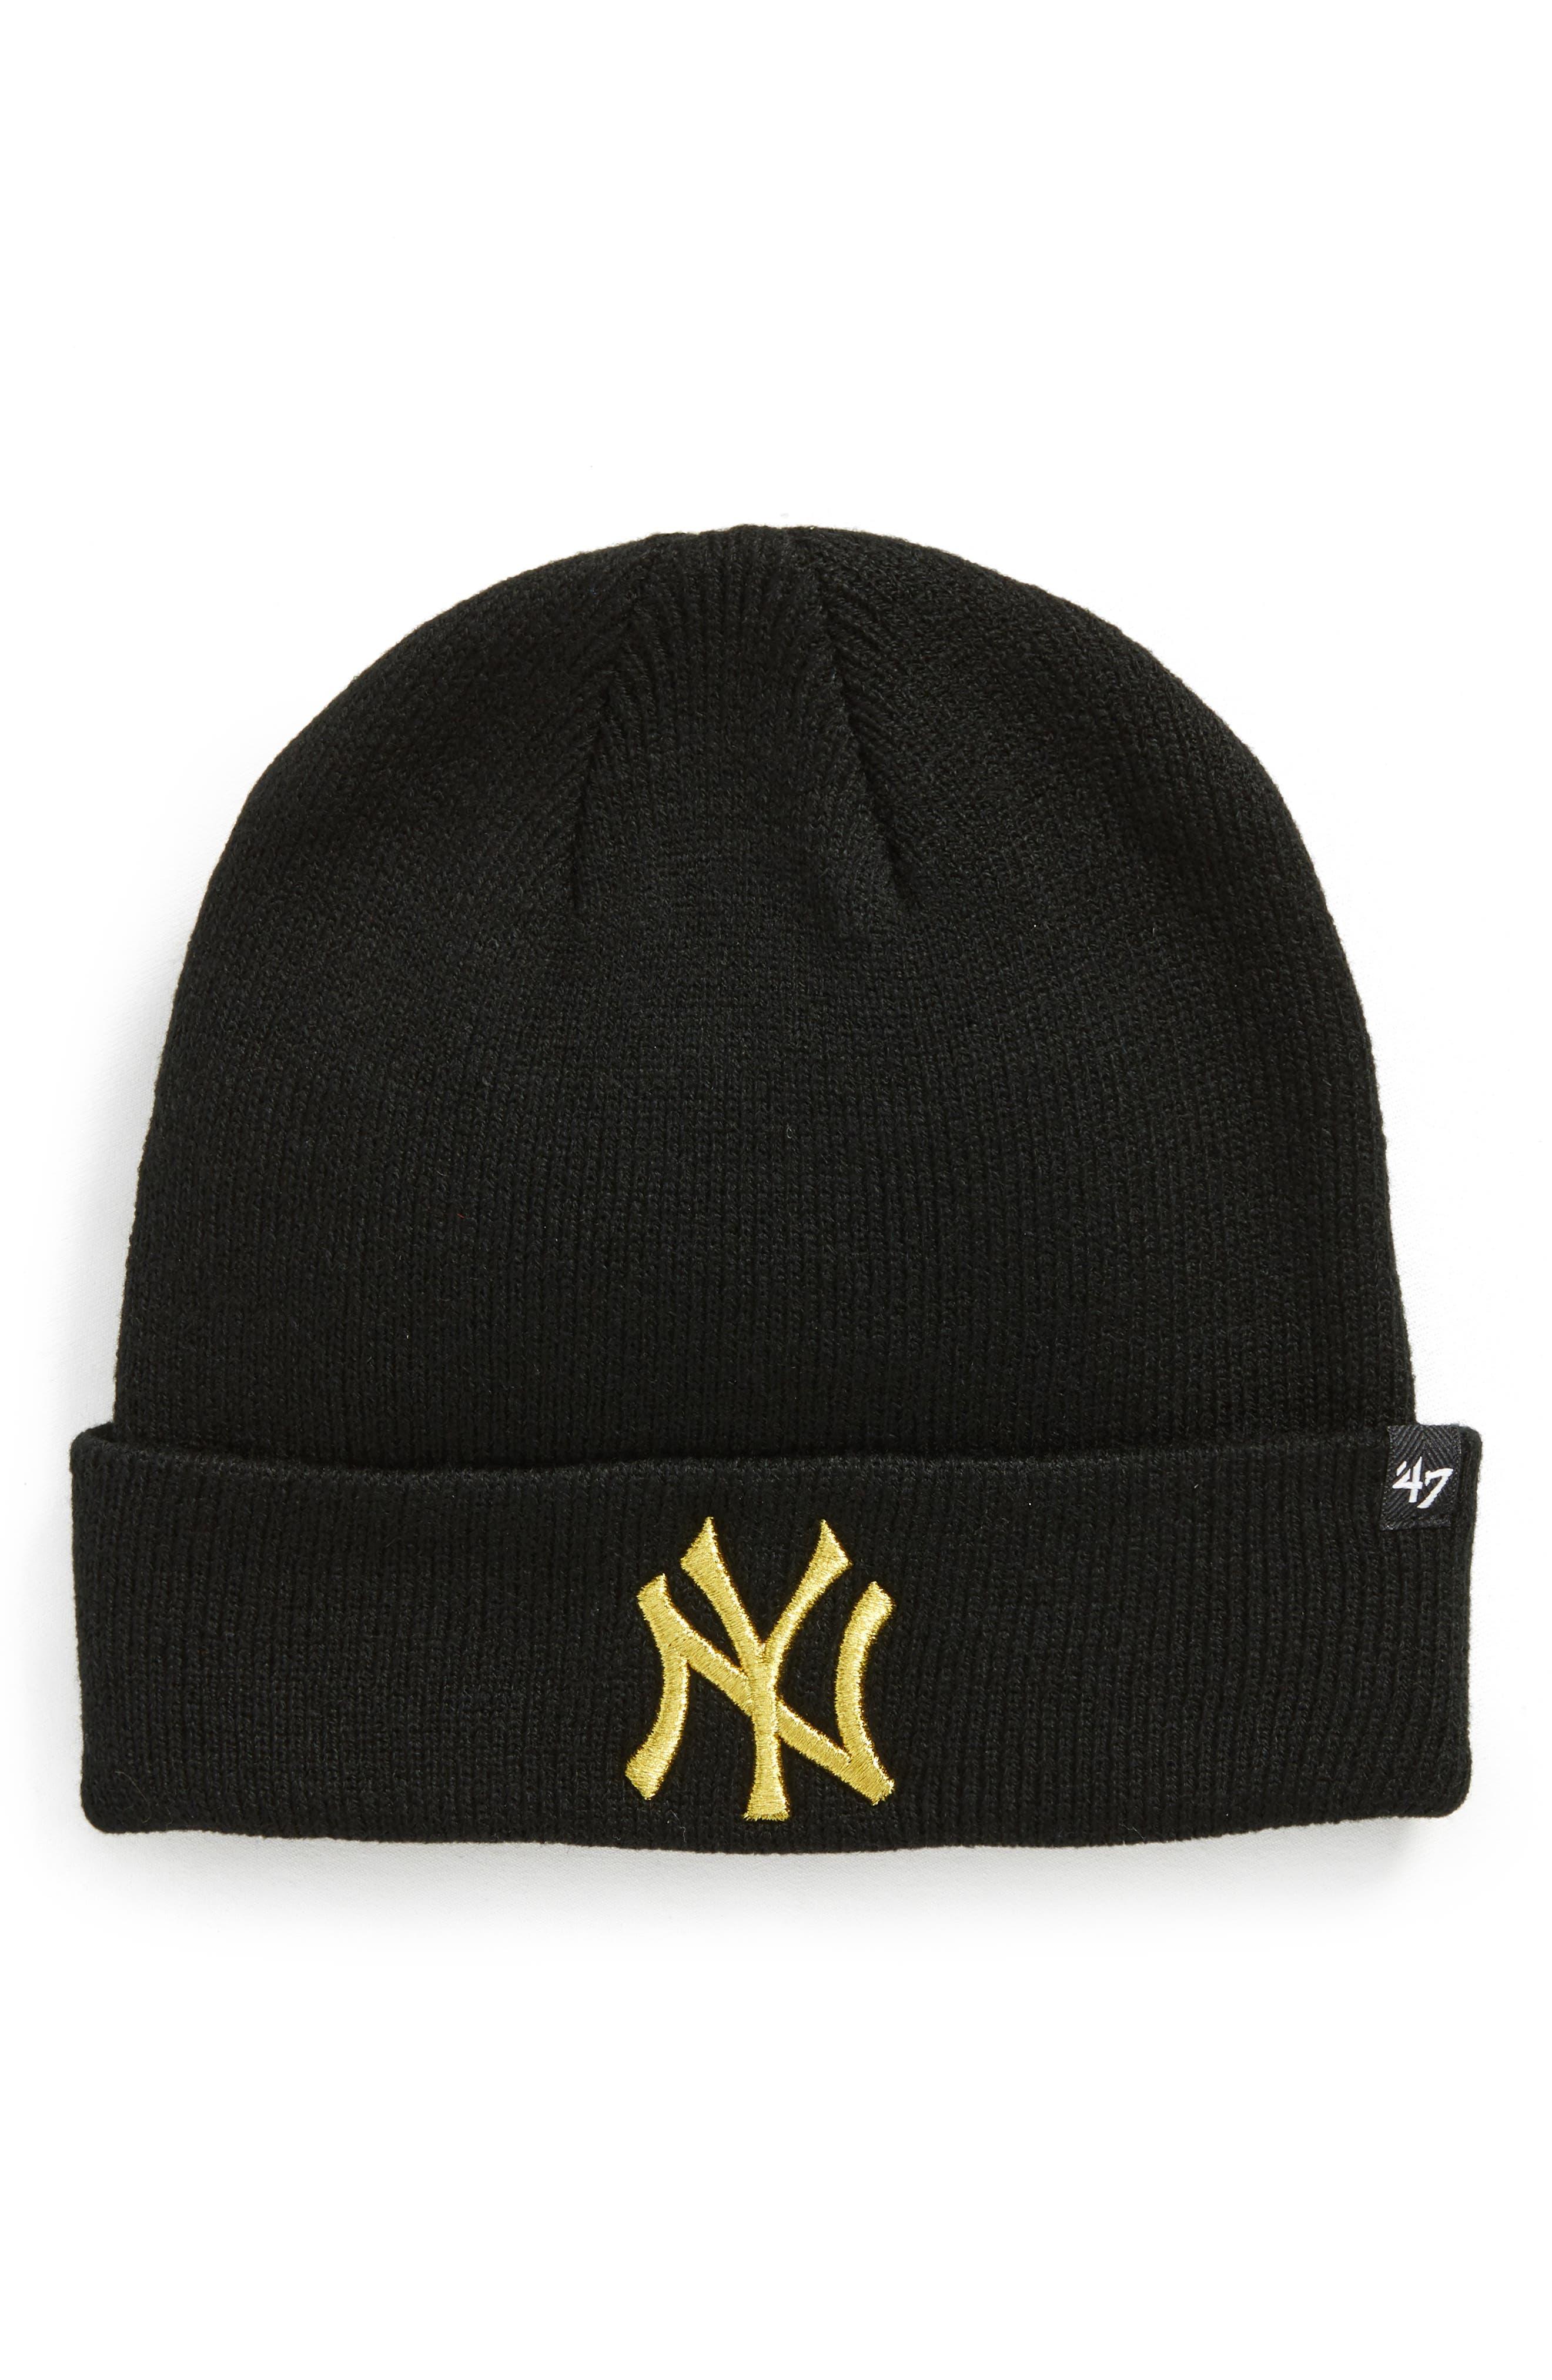 New York Yankees Metallic Beanie,                         Main,                         color, Black